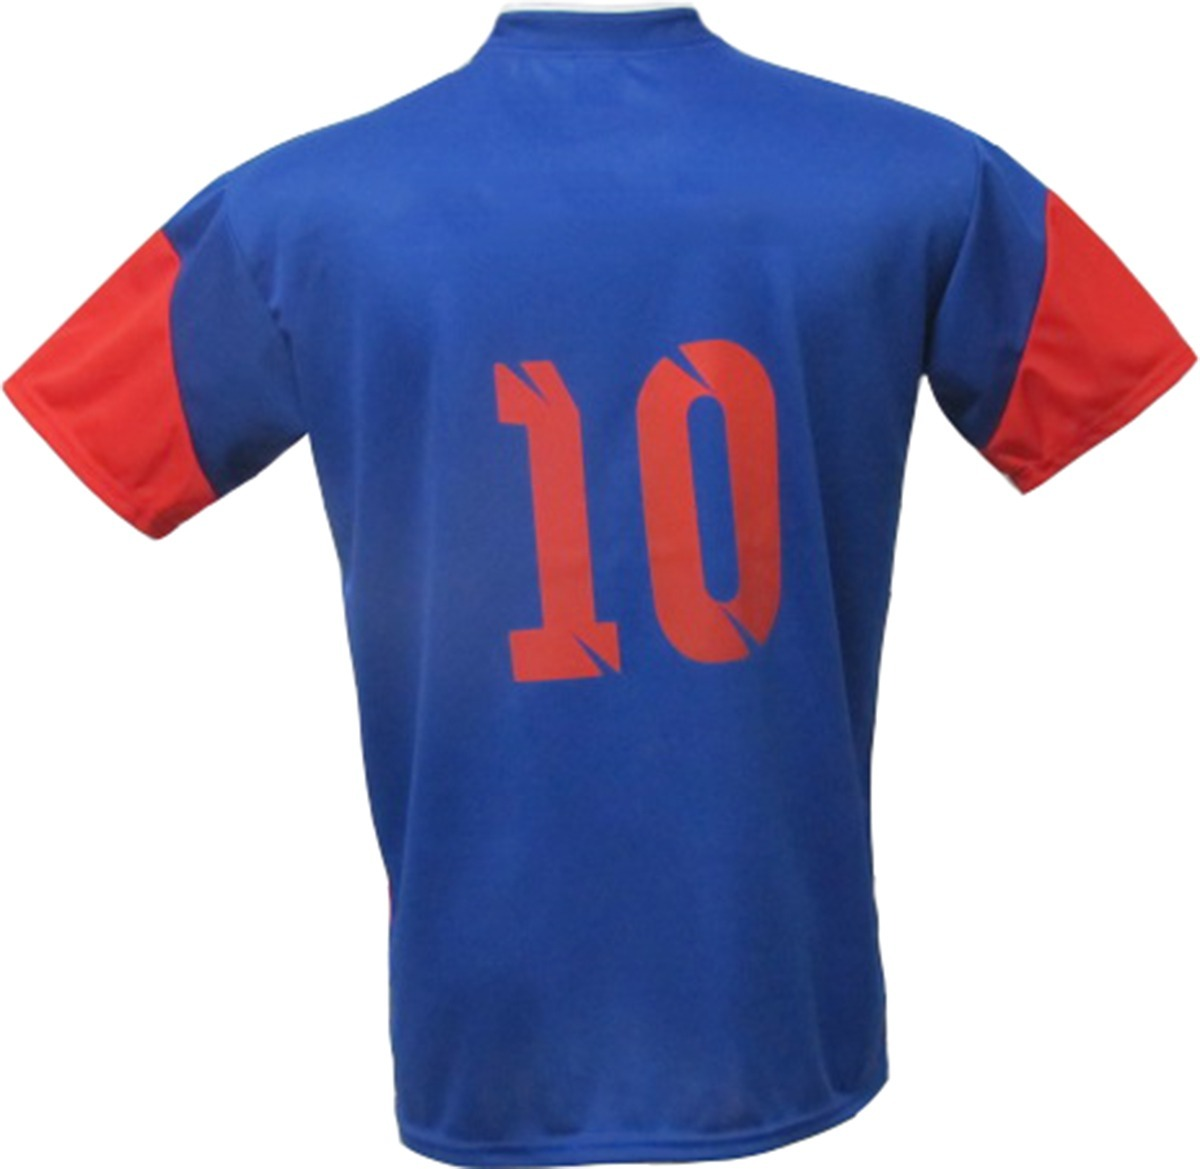 1c55388fb5 Kit 5 Camisa Em Dryfit Numerada Futebol Fardamento - R  141